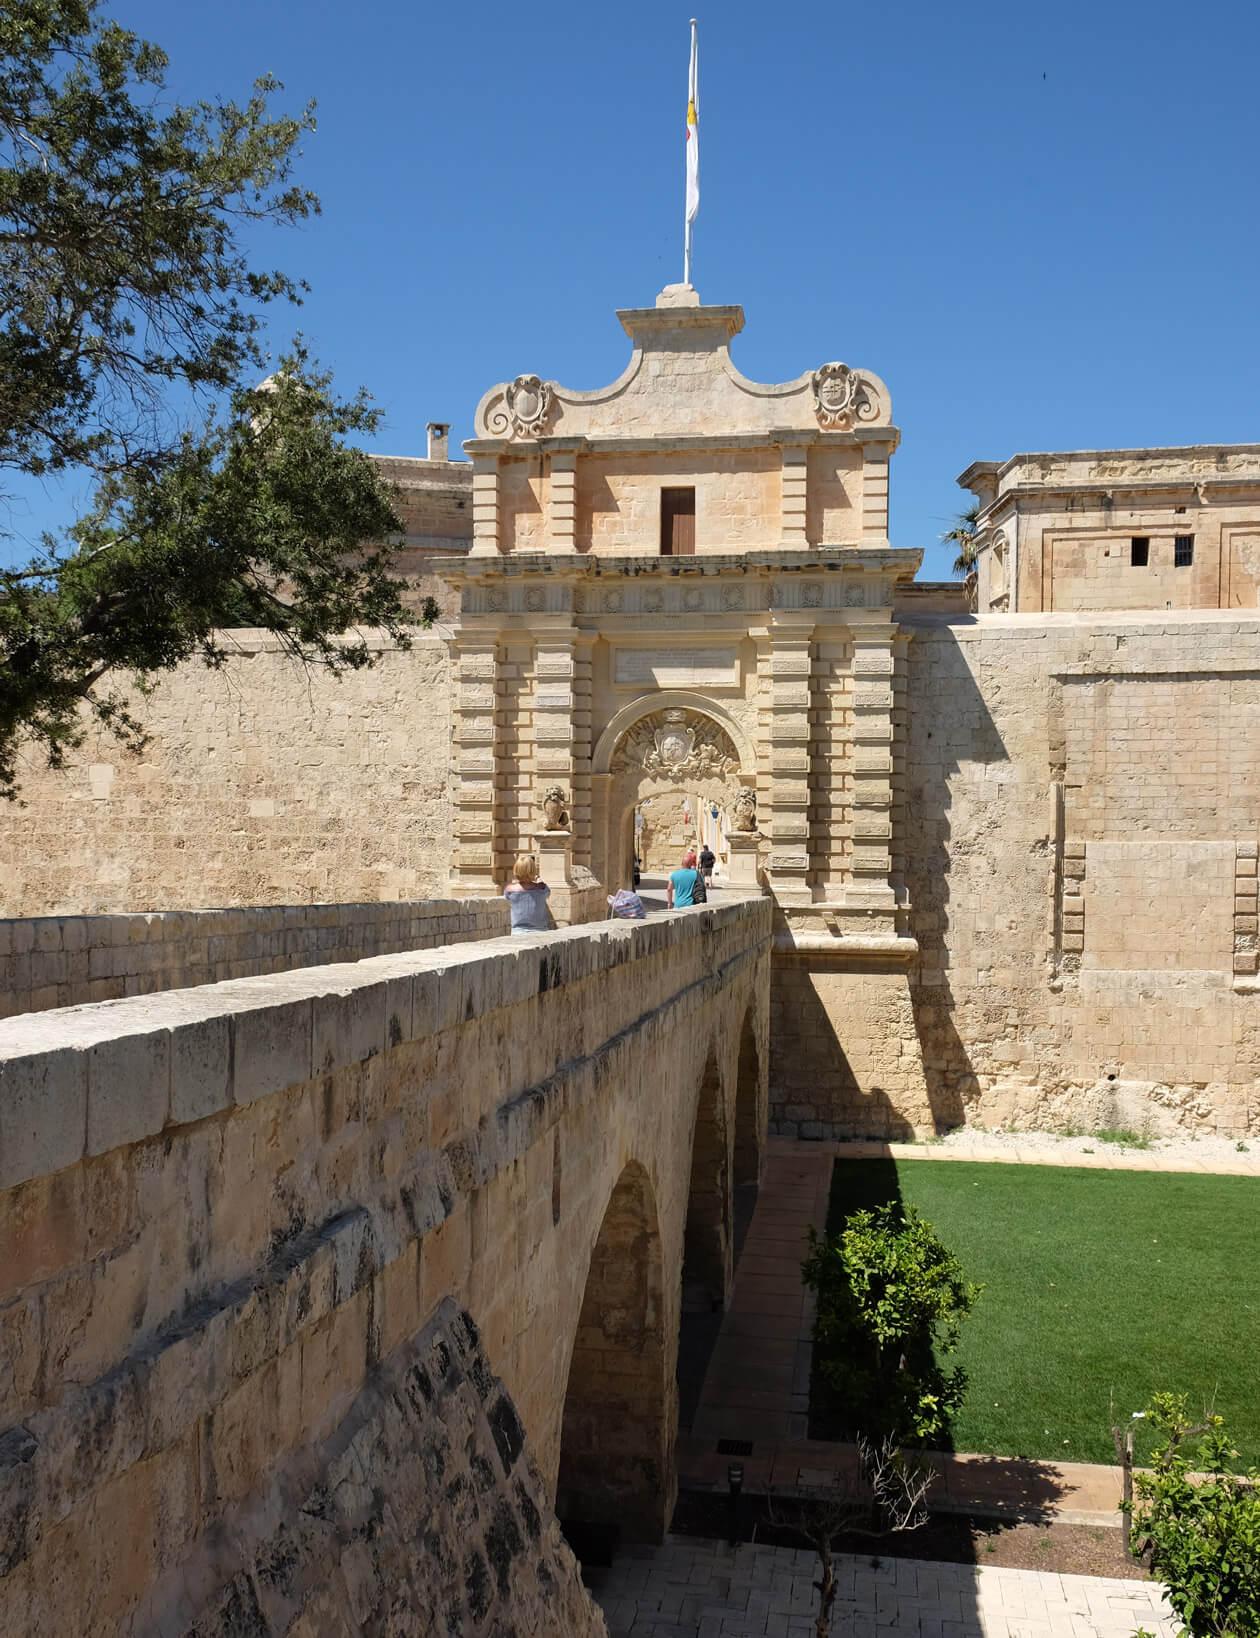 Mdina's main city gate